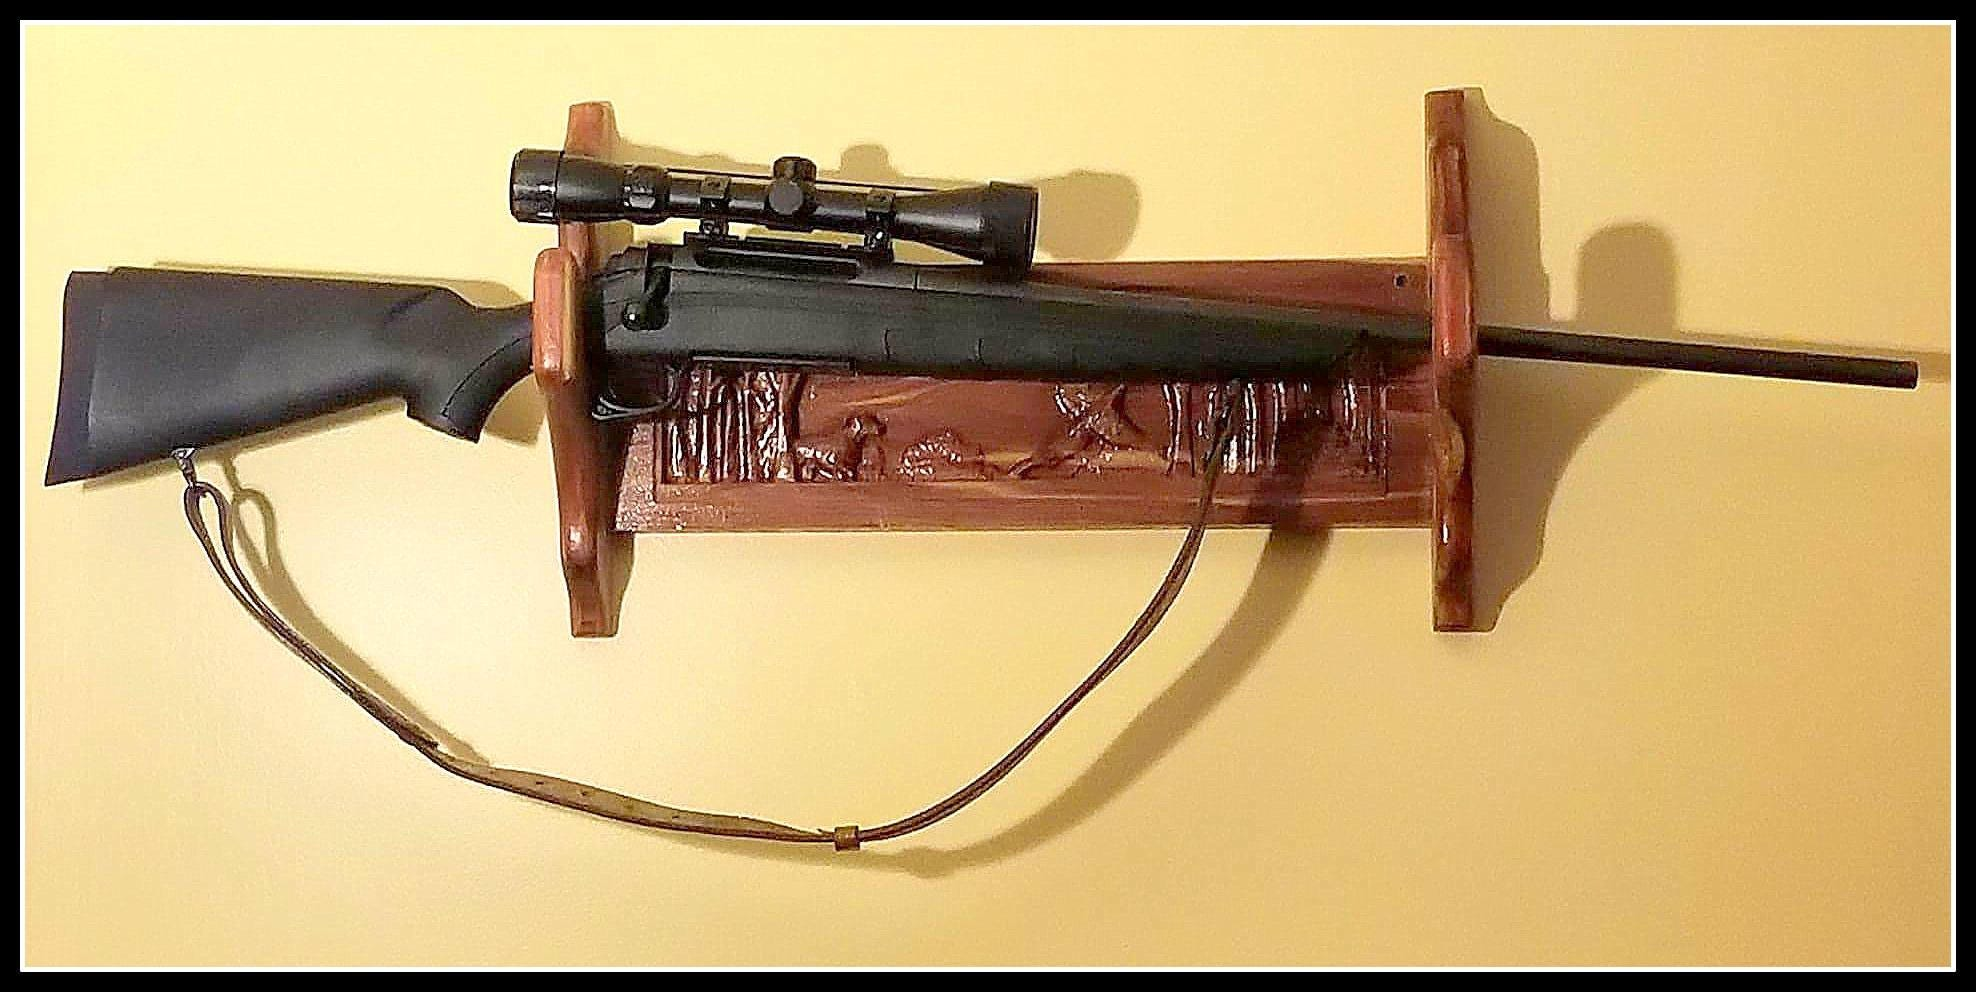 Western Red Cedar Gun Display Rack Gun Display Gun Display